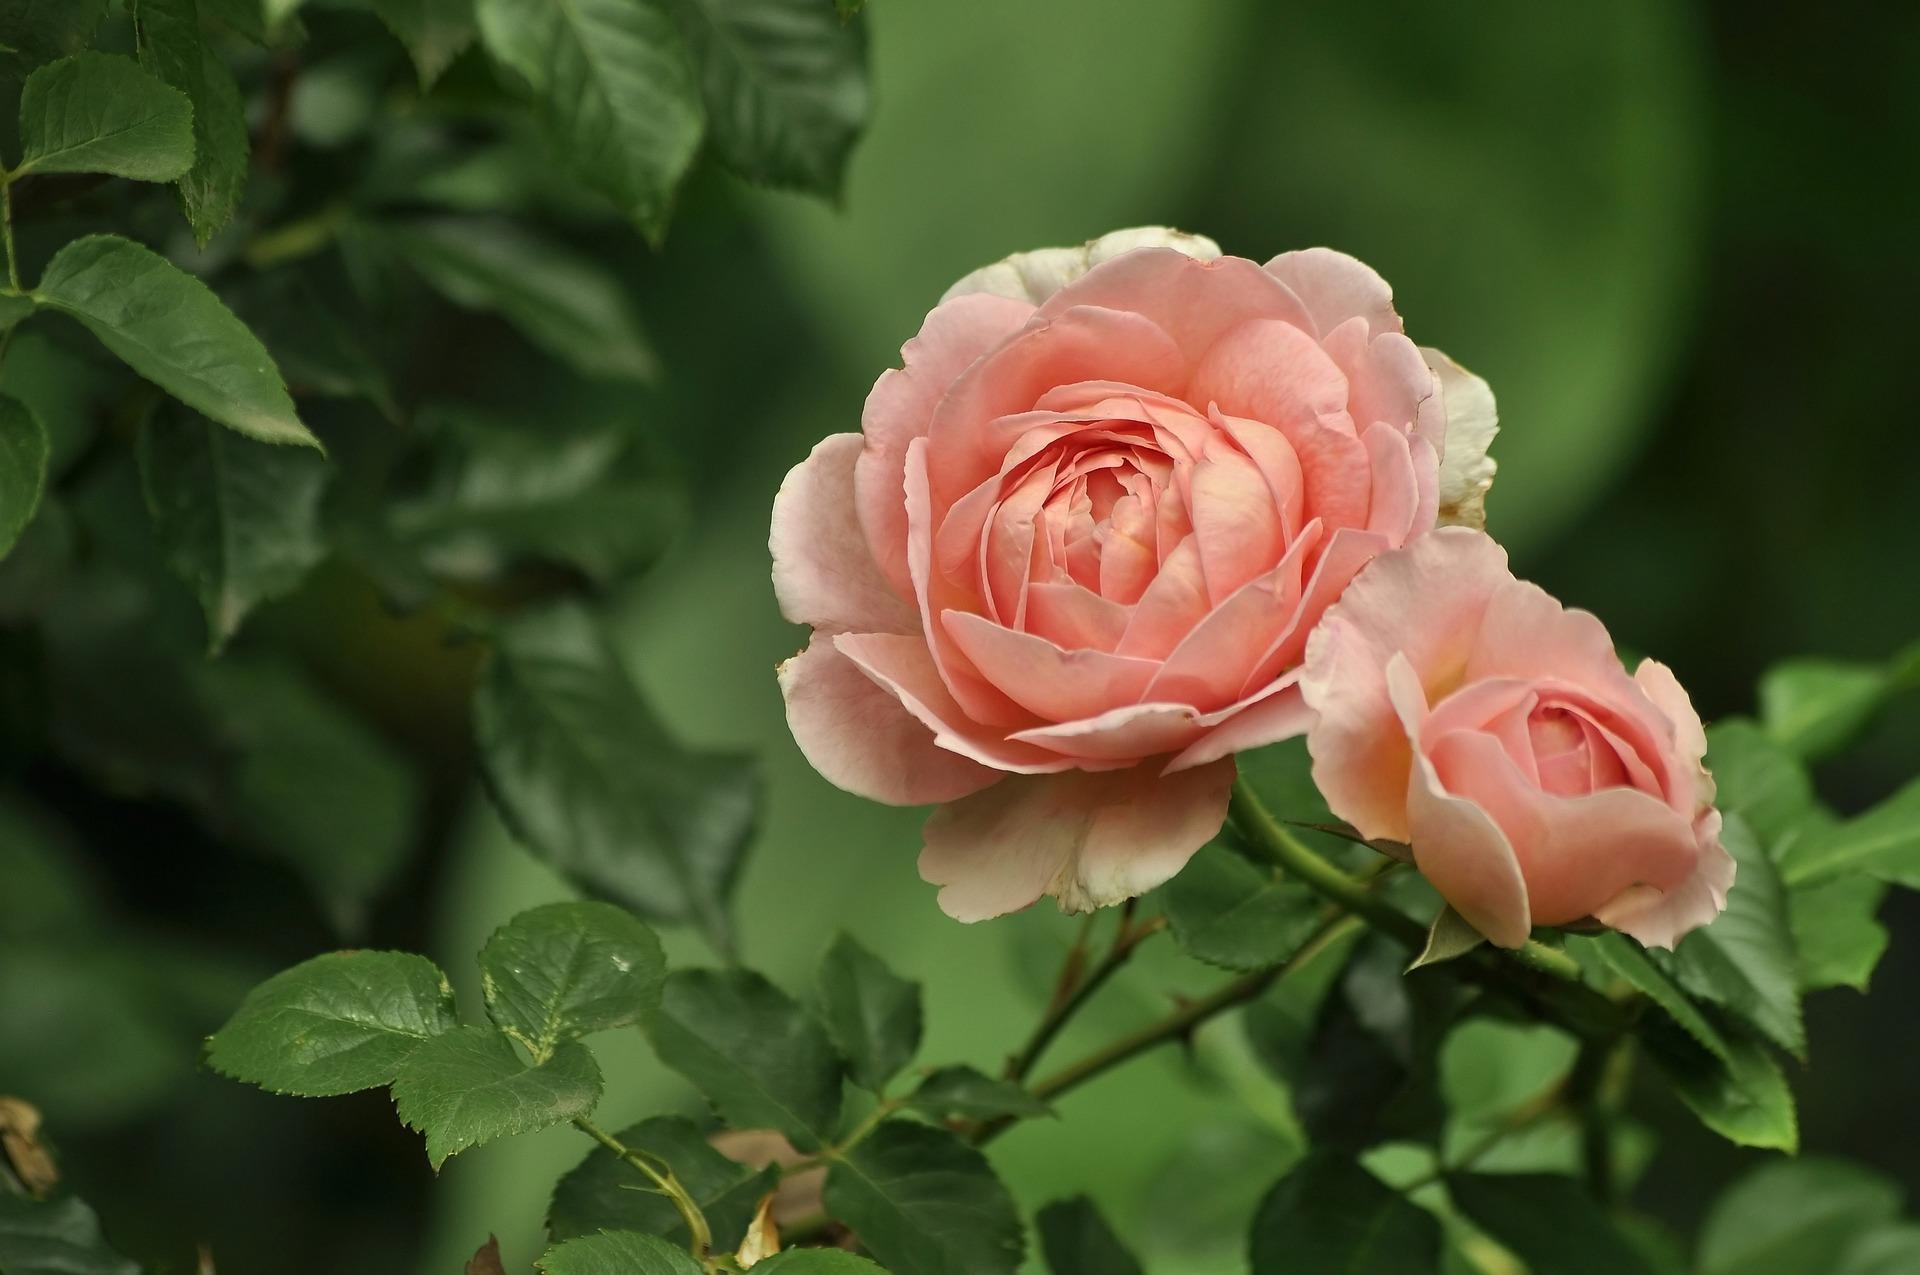 flowers-4352530_1920